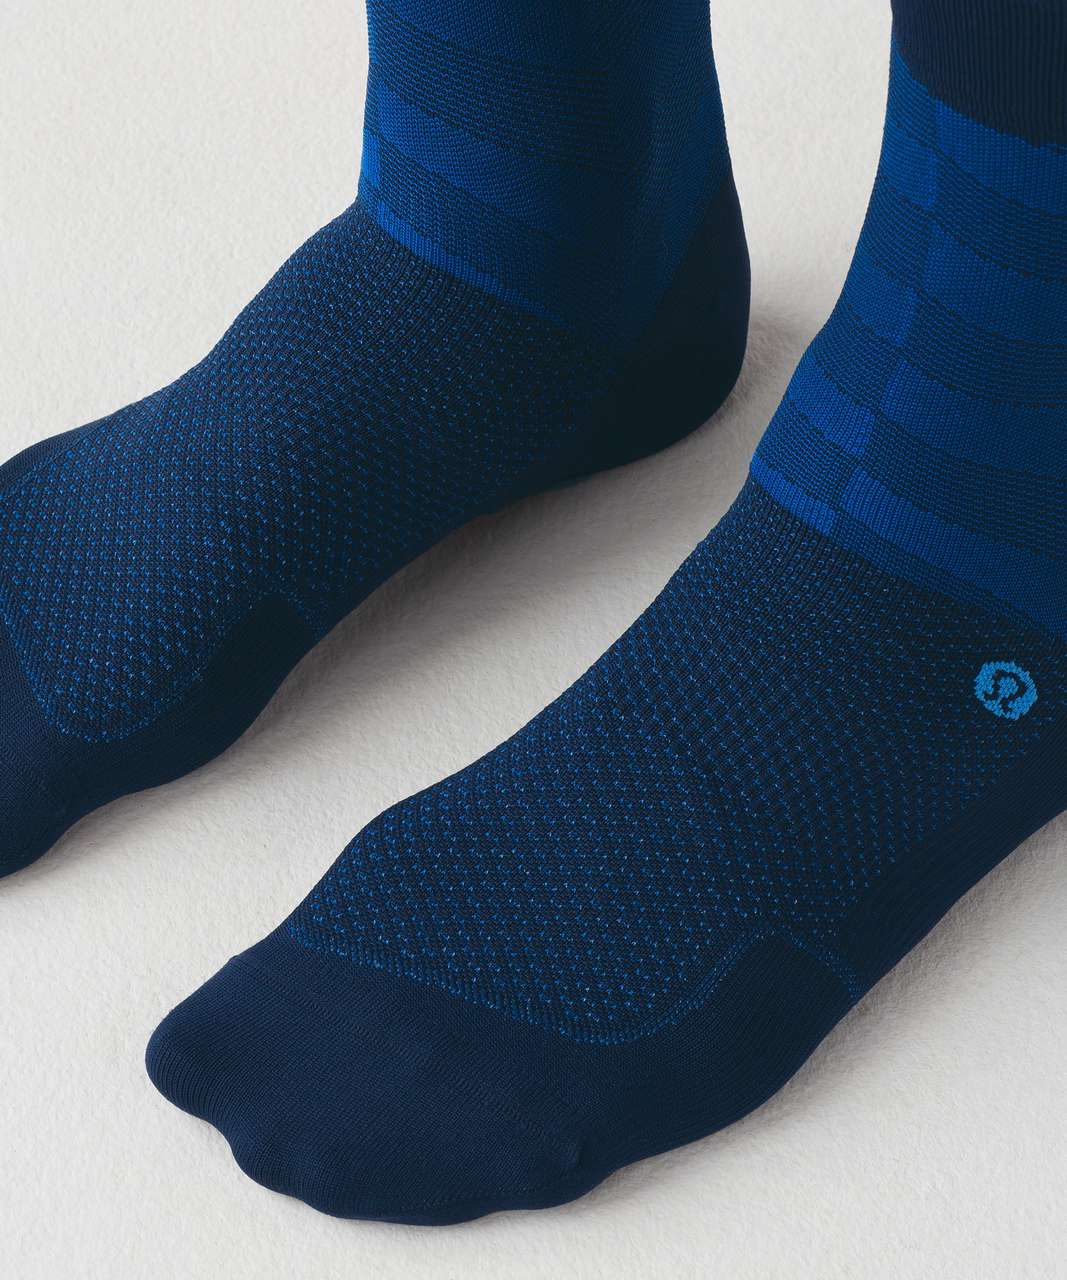 Lululemon City Sock Silver - Nautical Navy / Riviera / Velo Blue